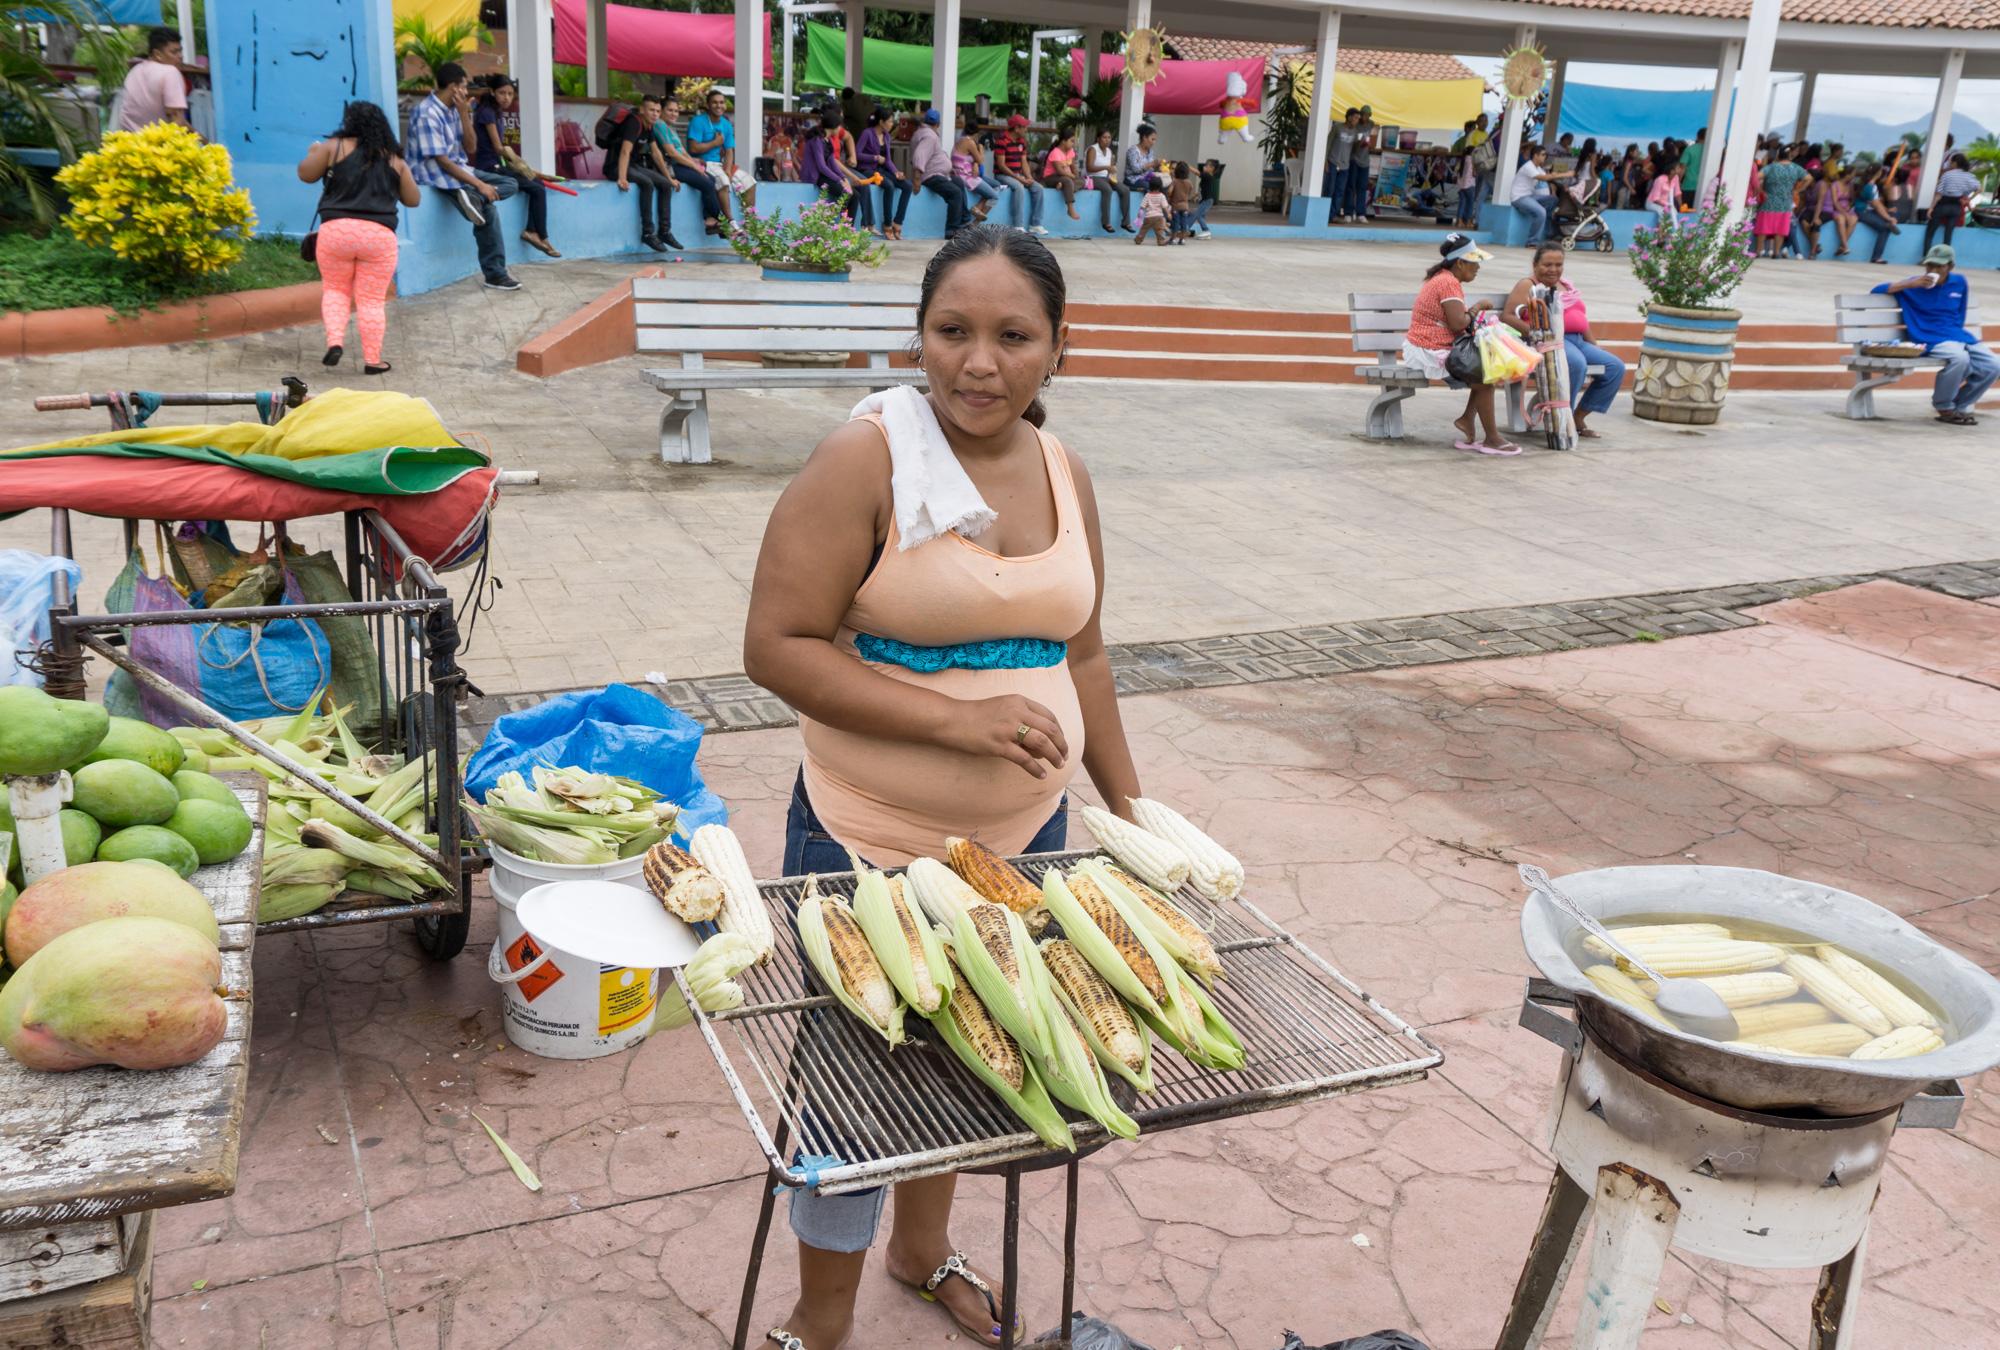 Female street vendor in Managua, Nicaragua